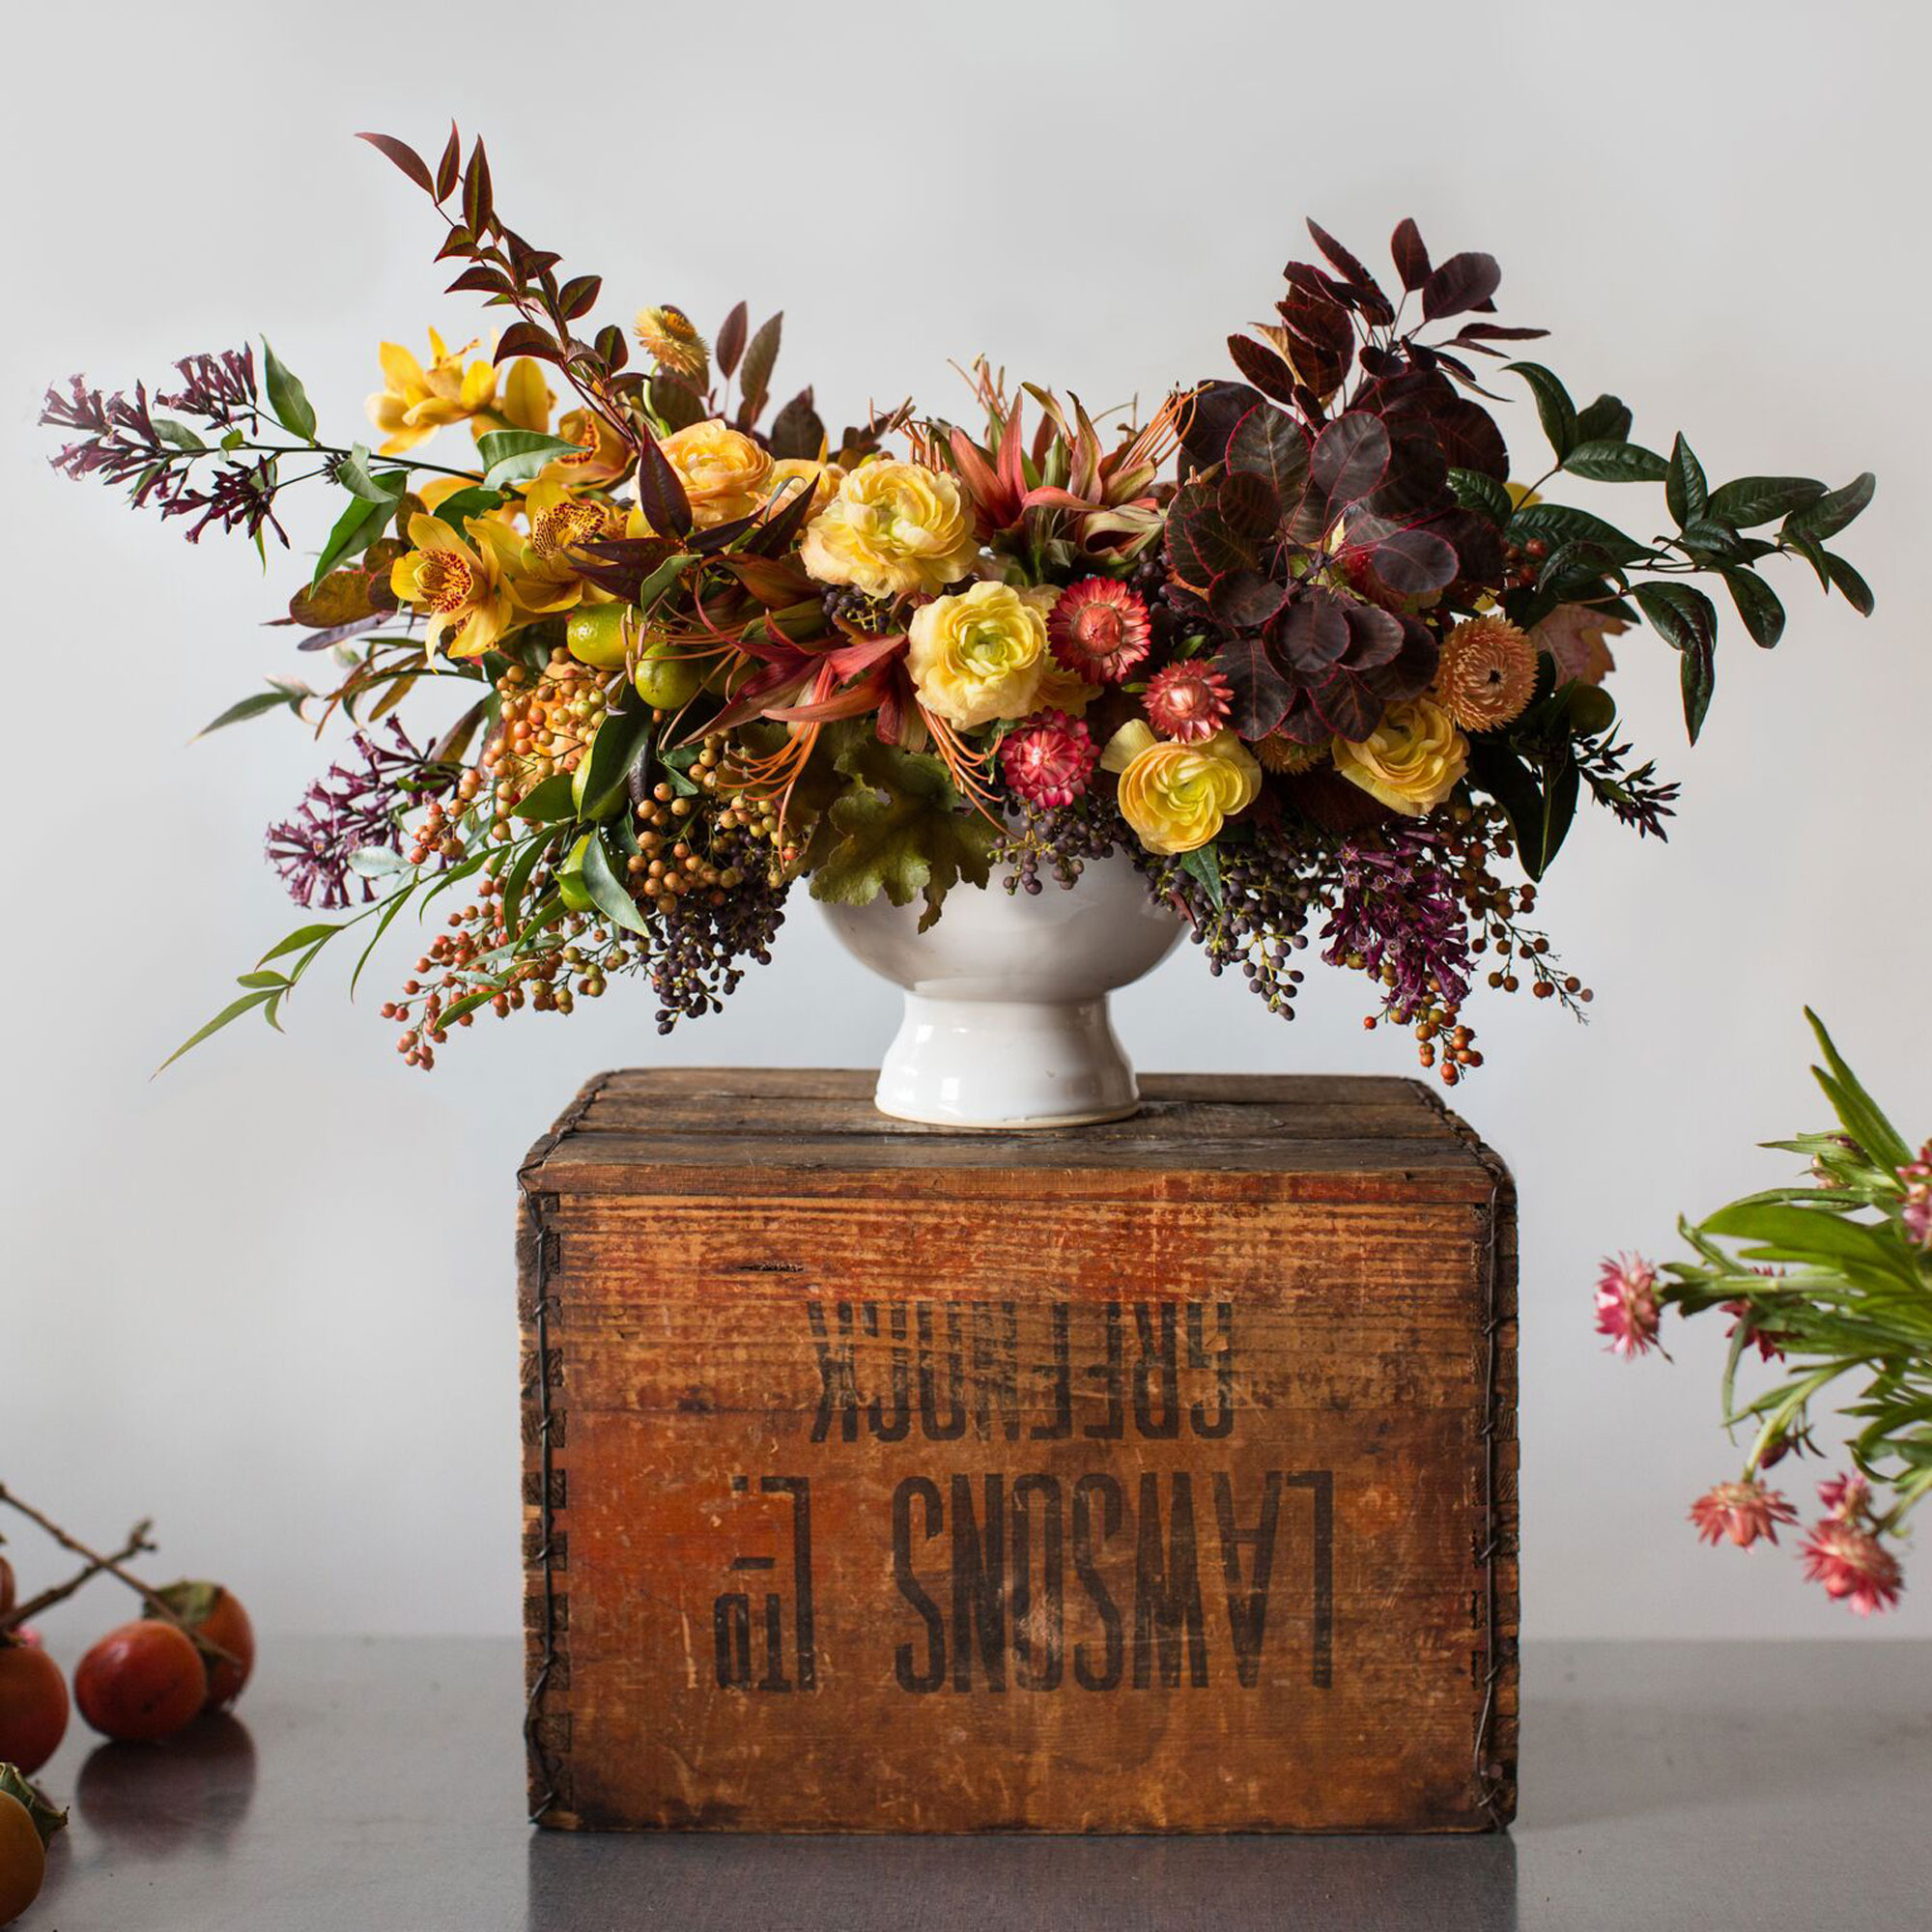 10 Creative Fall Tabletop Ideas